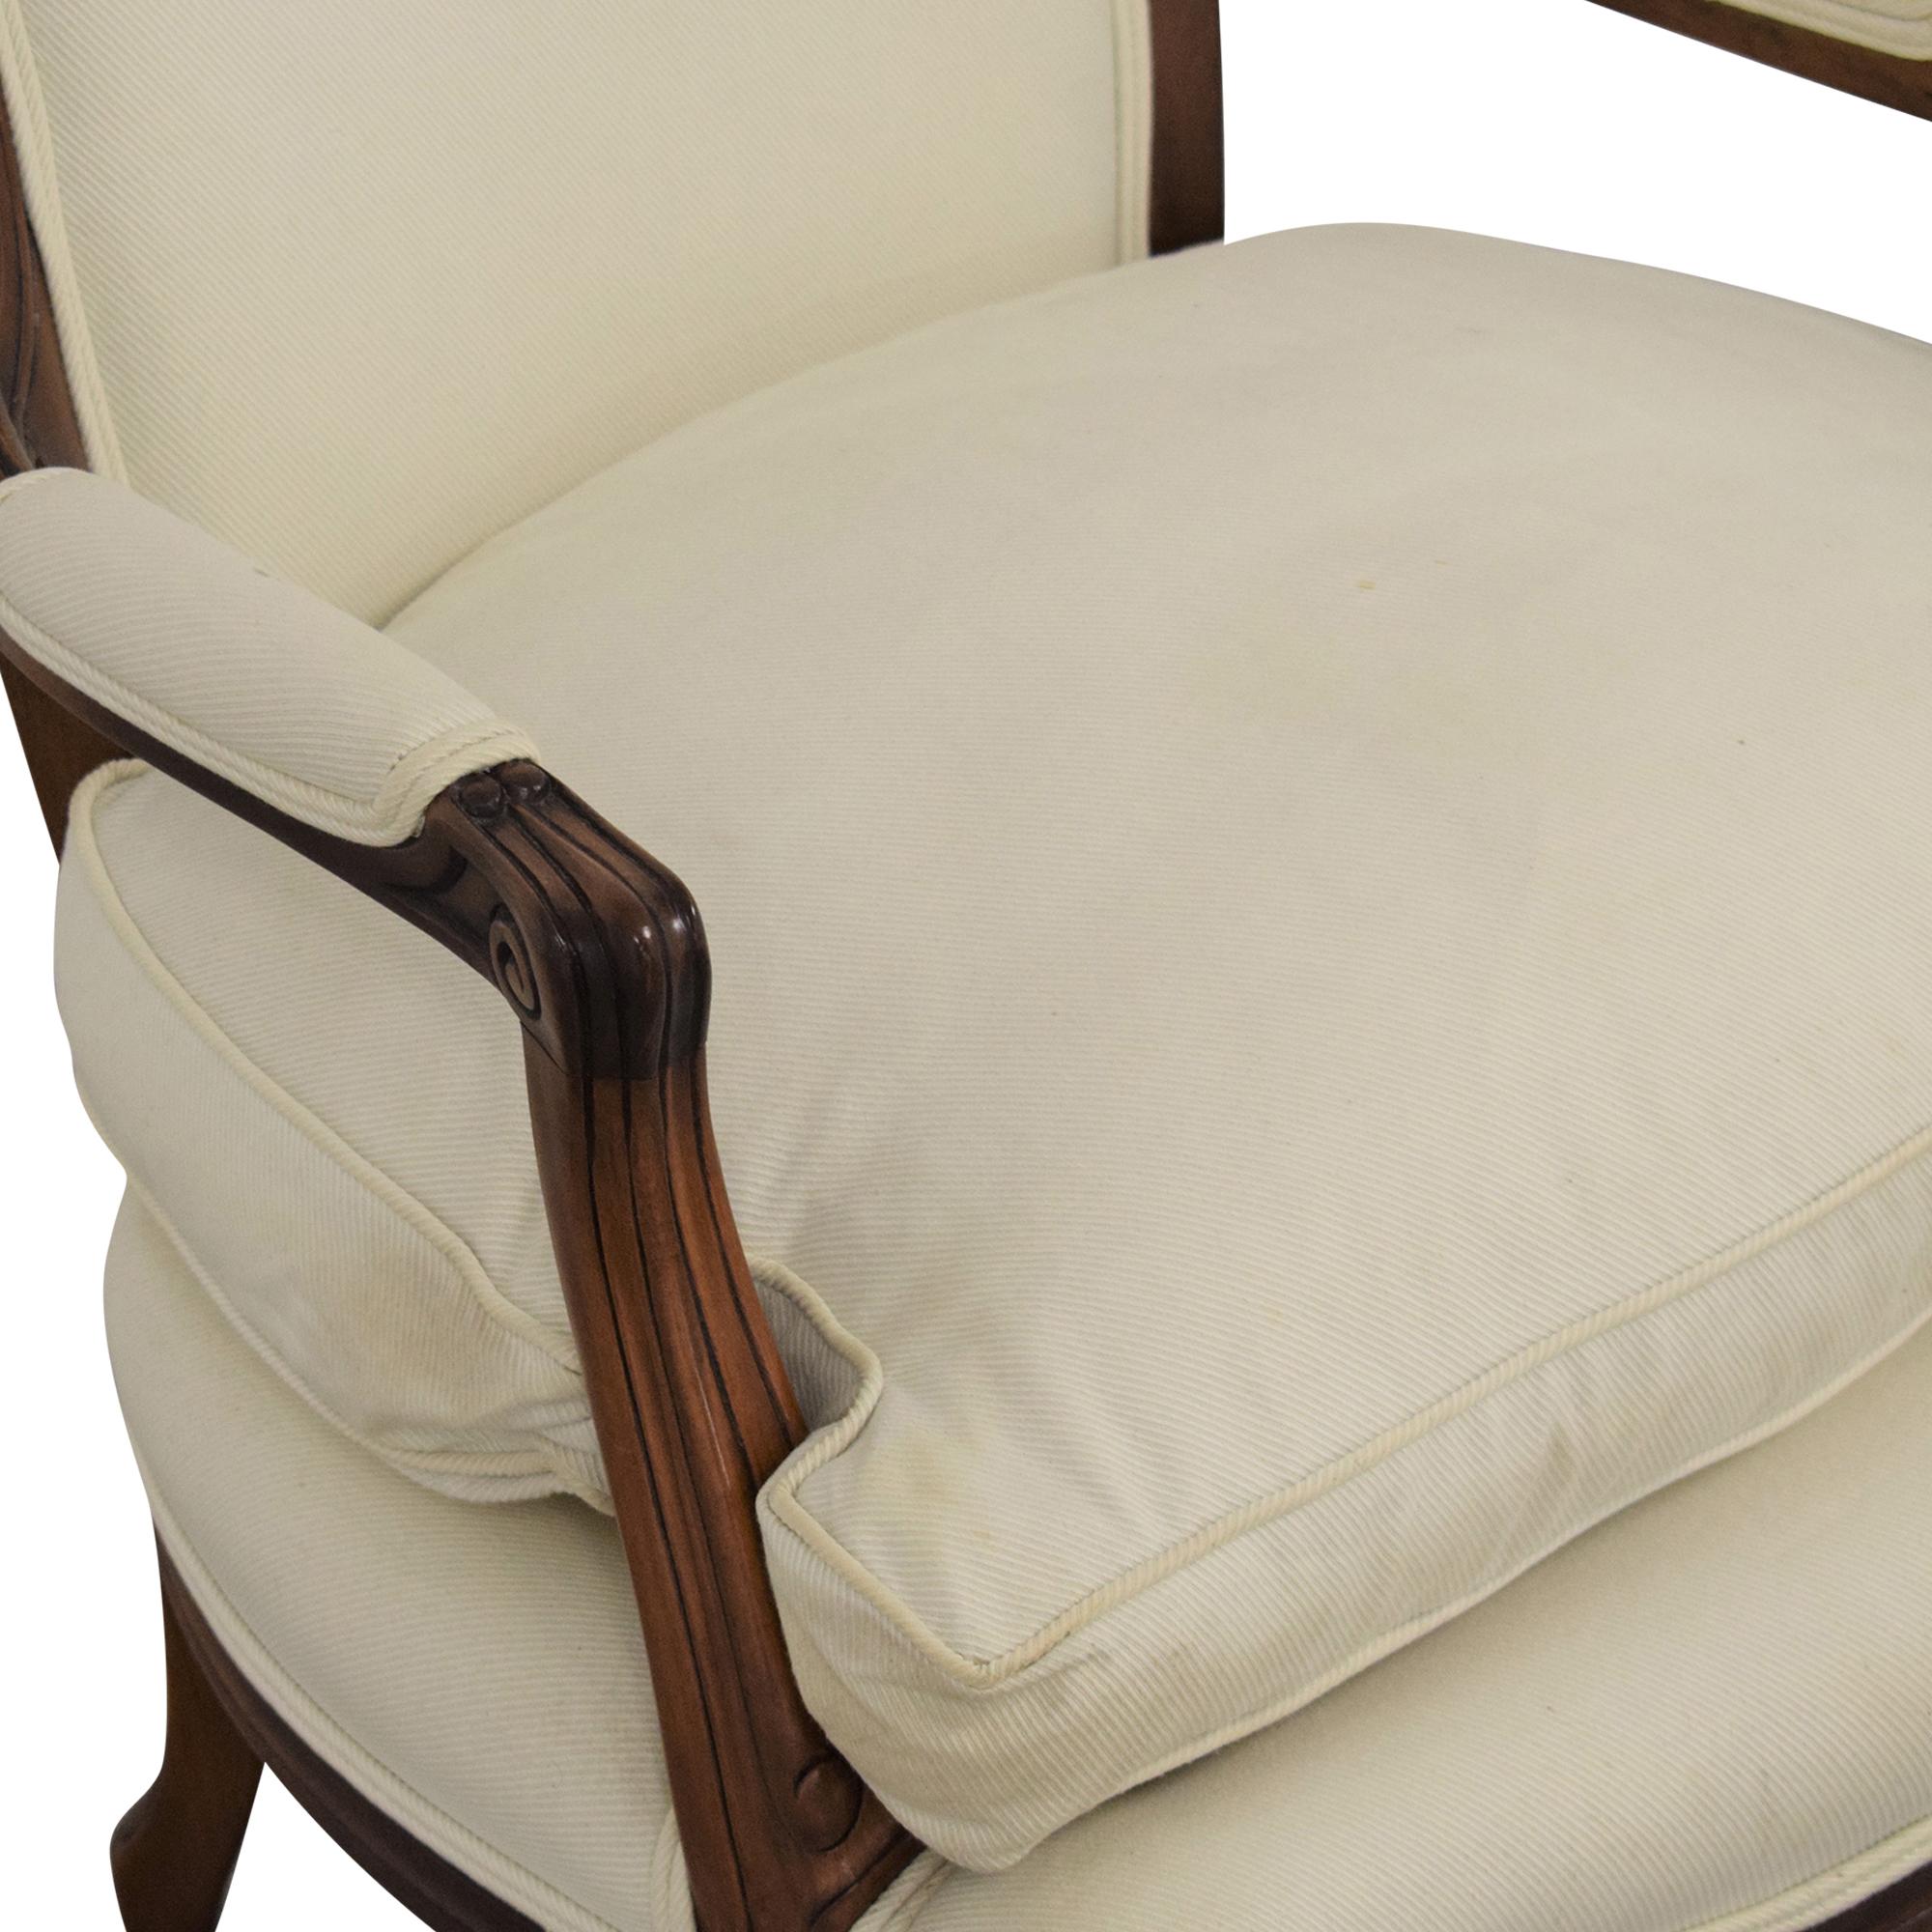 Meyer Gunther Martini Meyer Gunther Martini Louis XV Chair nyc